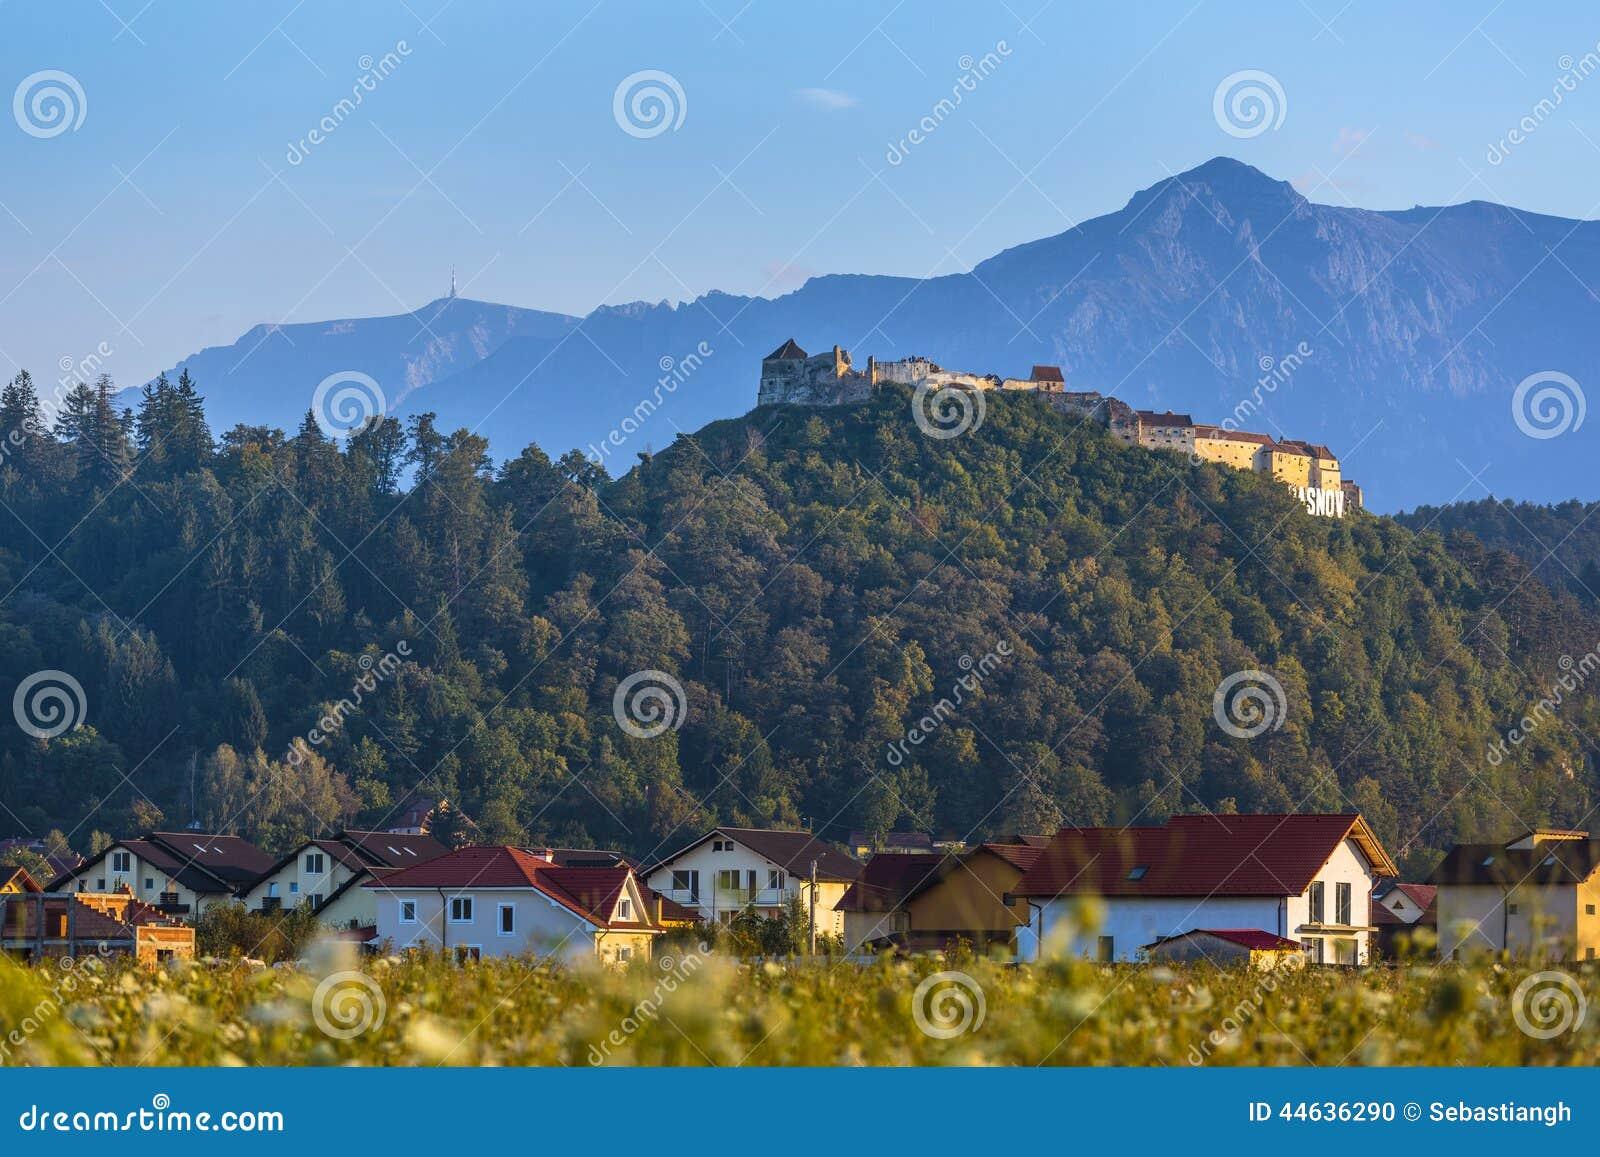 Forteresse de Rasnov et montagnes de Bucegi, Roumanie